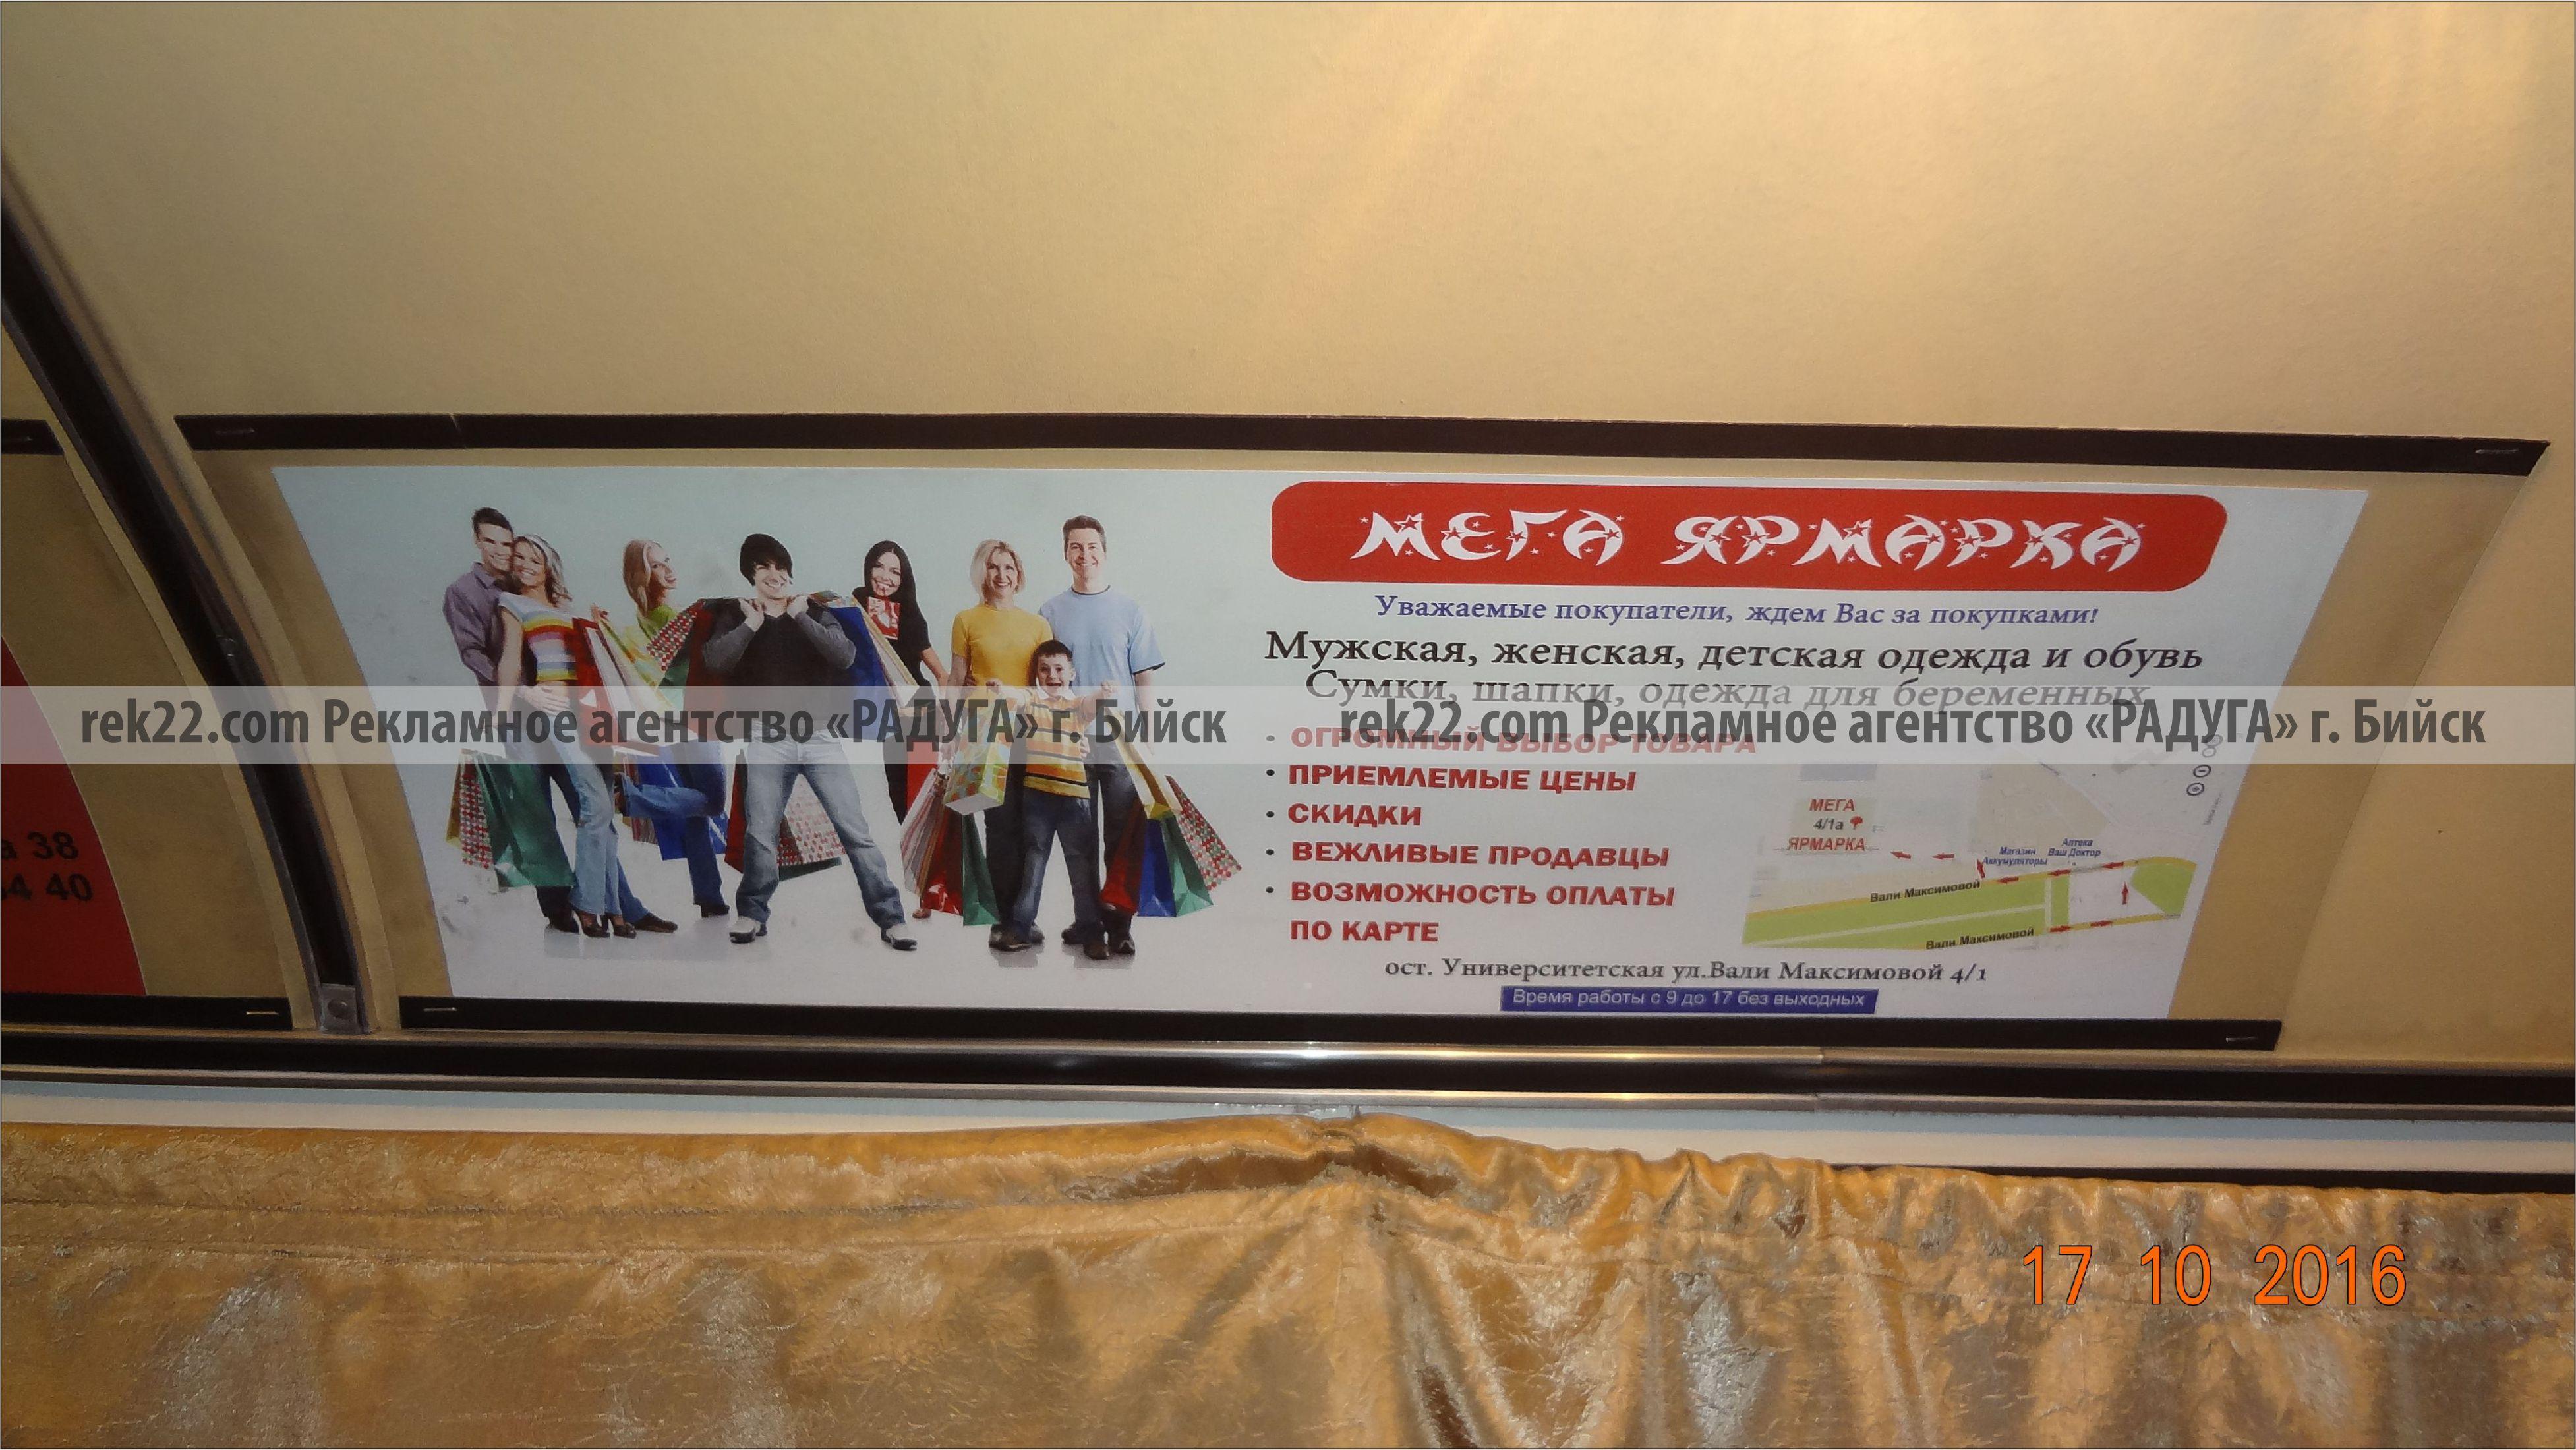 Реклама на транспорте Бийск - карманы, листовки - 5